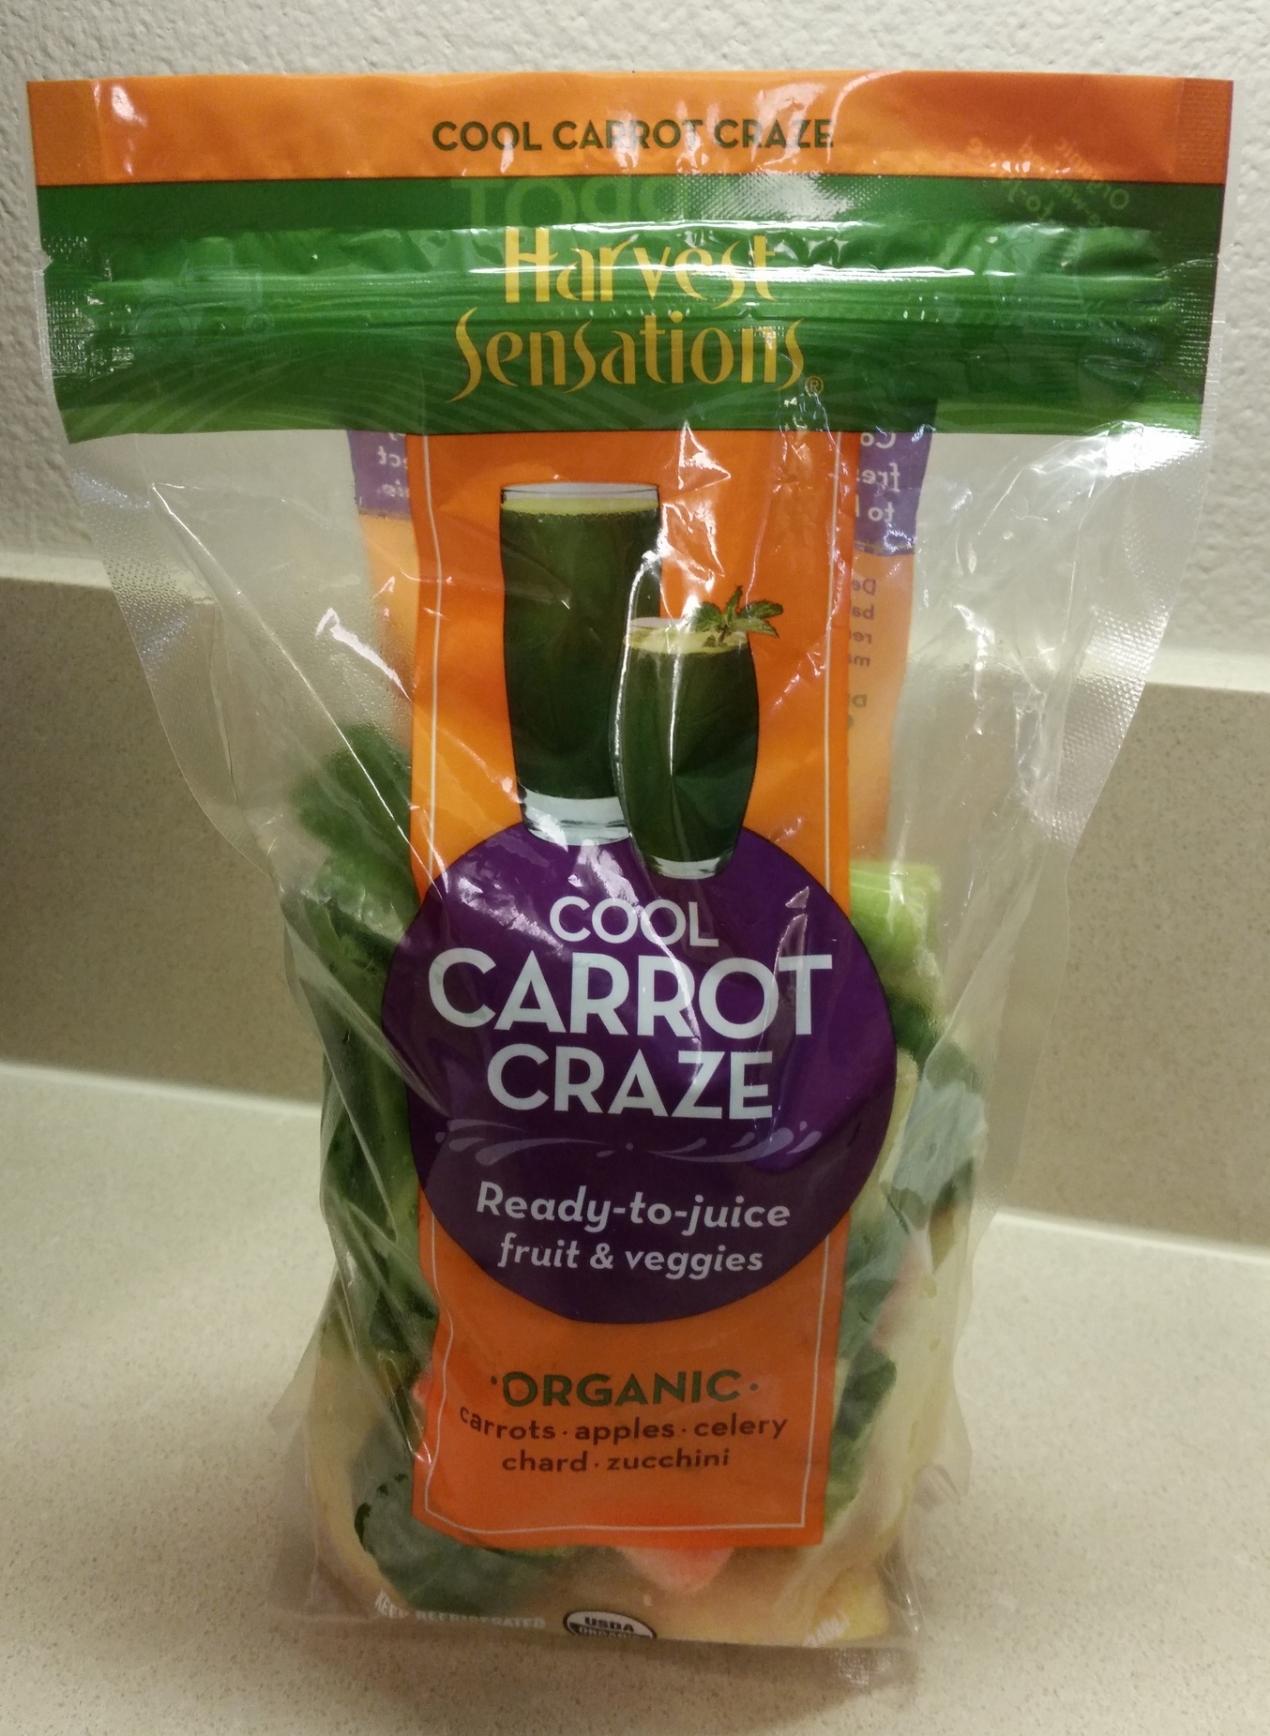 Harvest Sensations Cool Carrot Craze